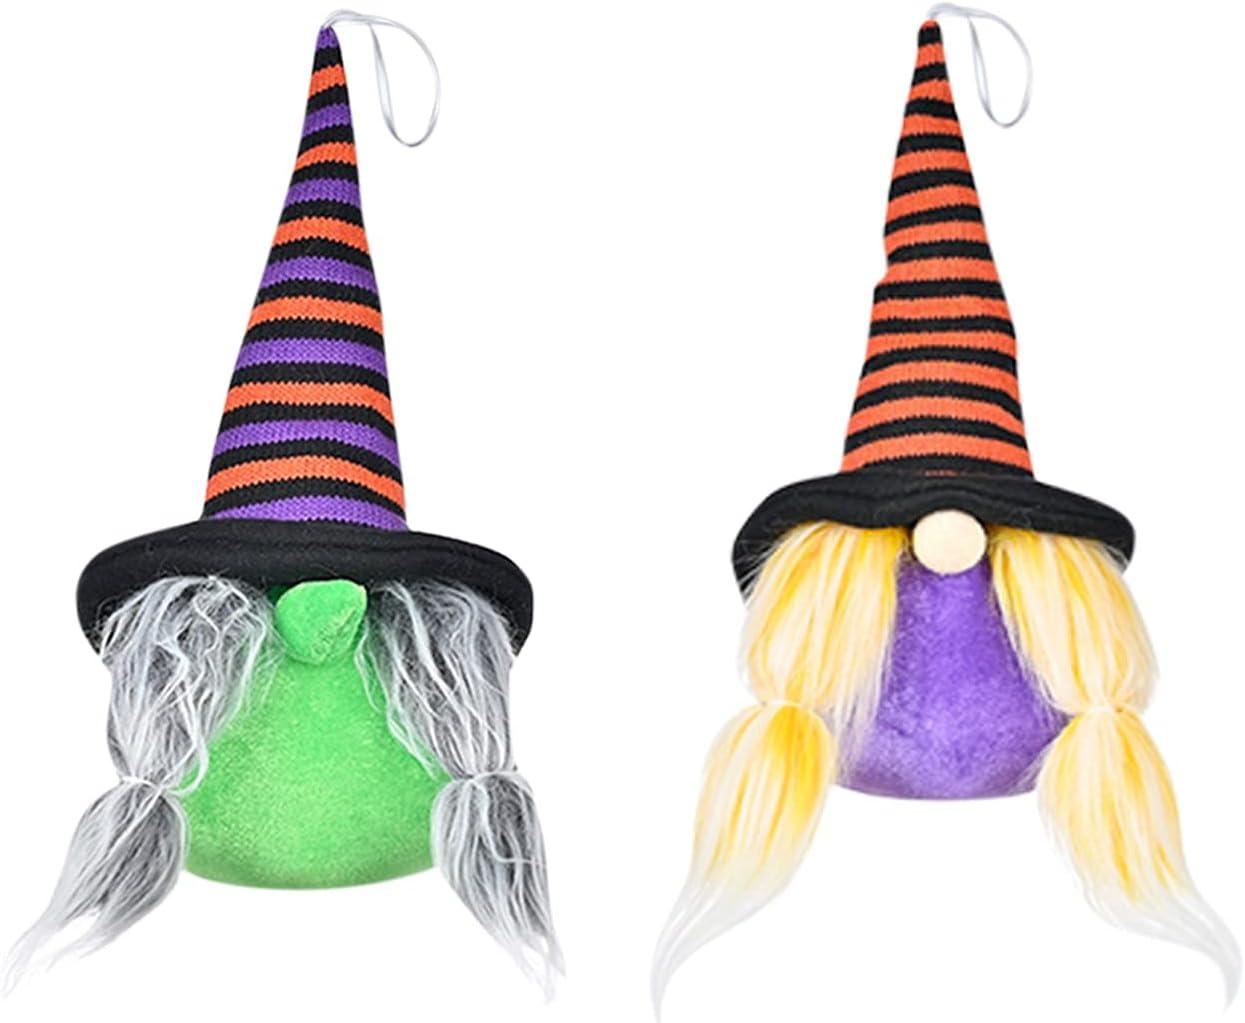 CKK 2Pcs Set Hallowen Gnomes Plush Doll Free shipping on posting reviews Lighted Faceless Decor G Sale price